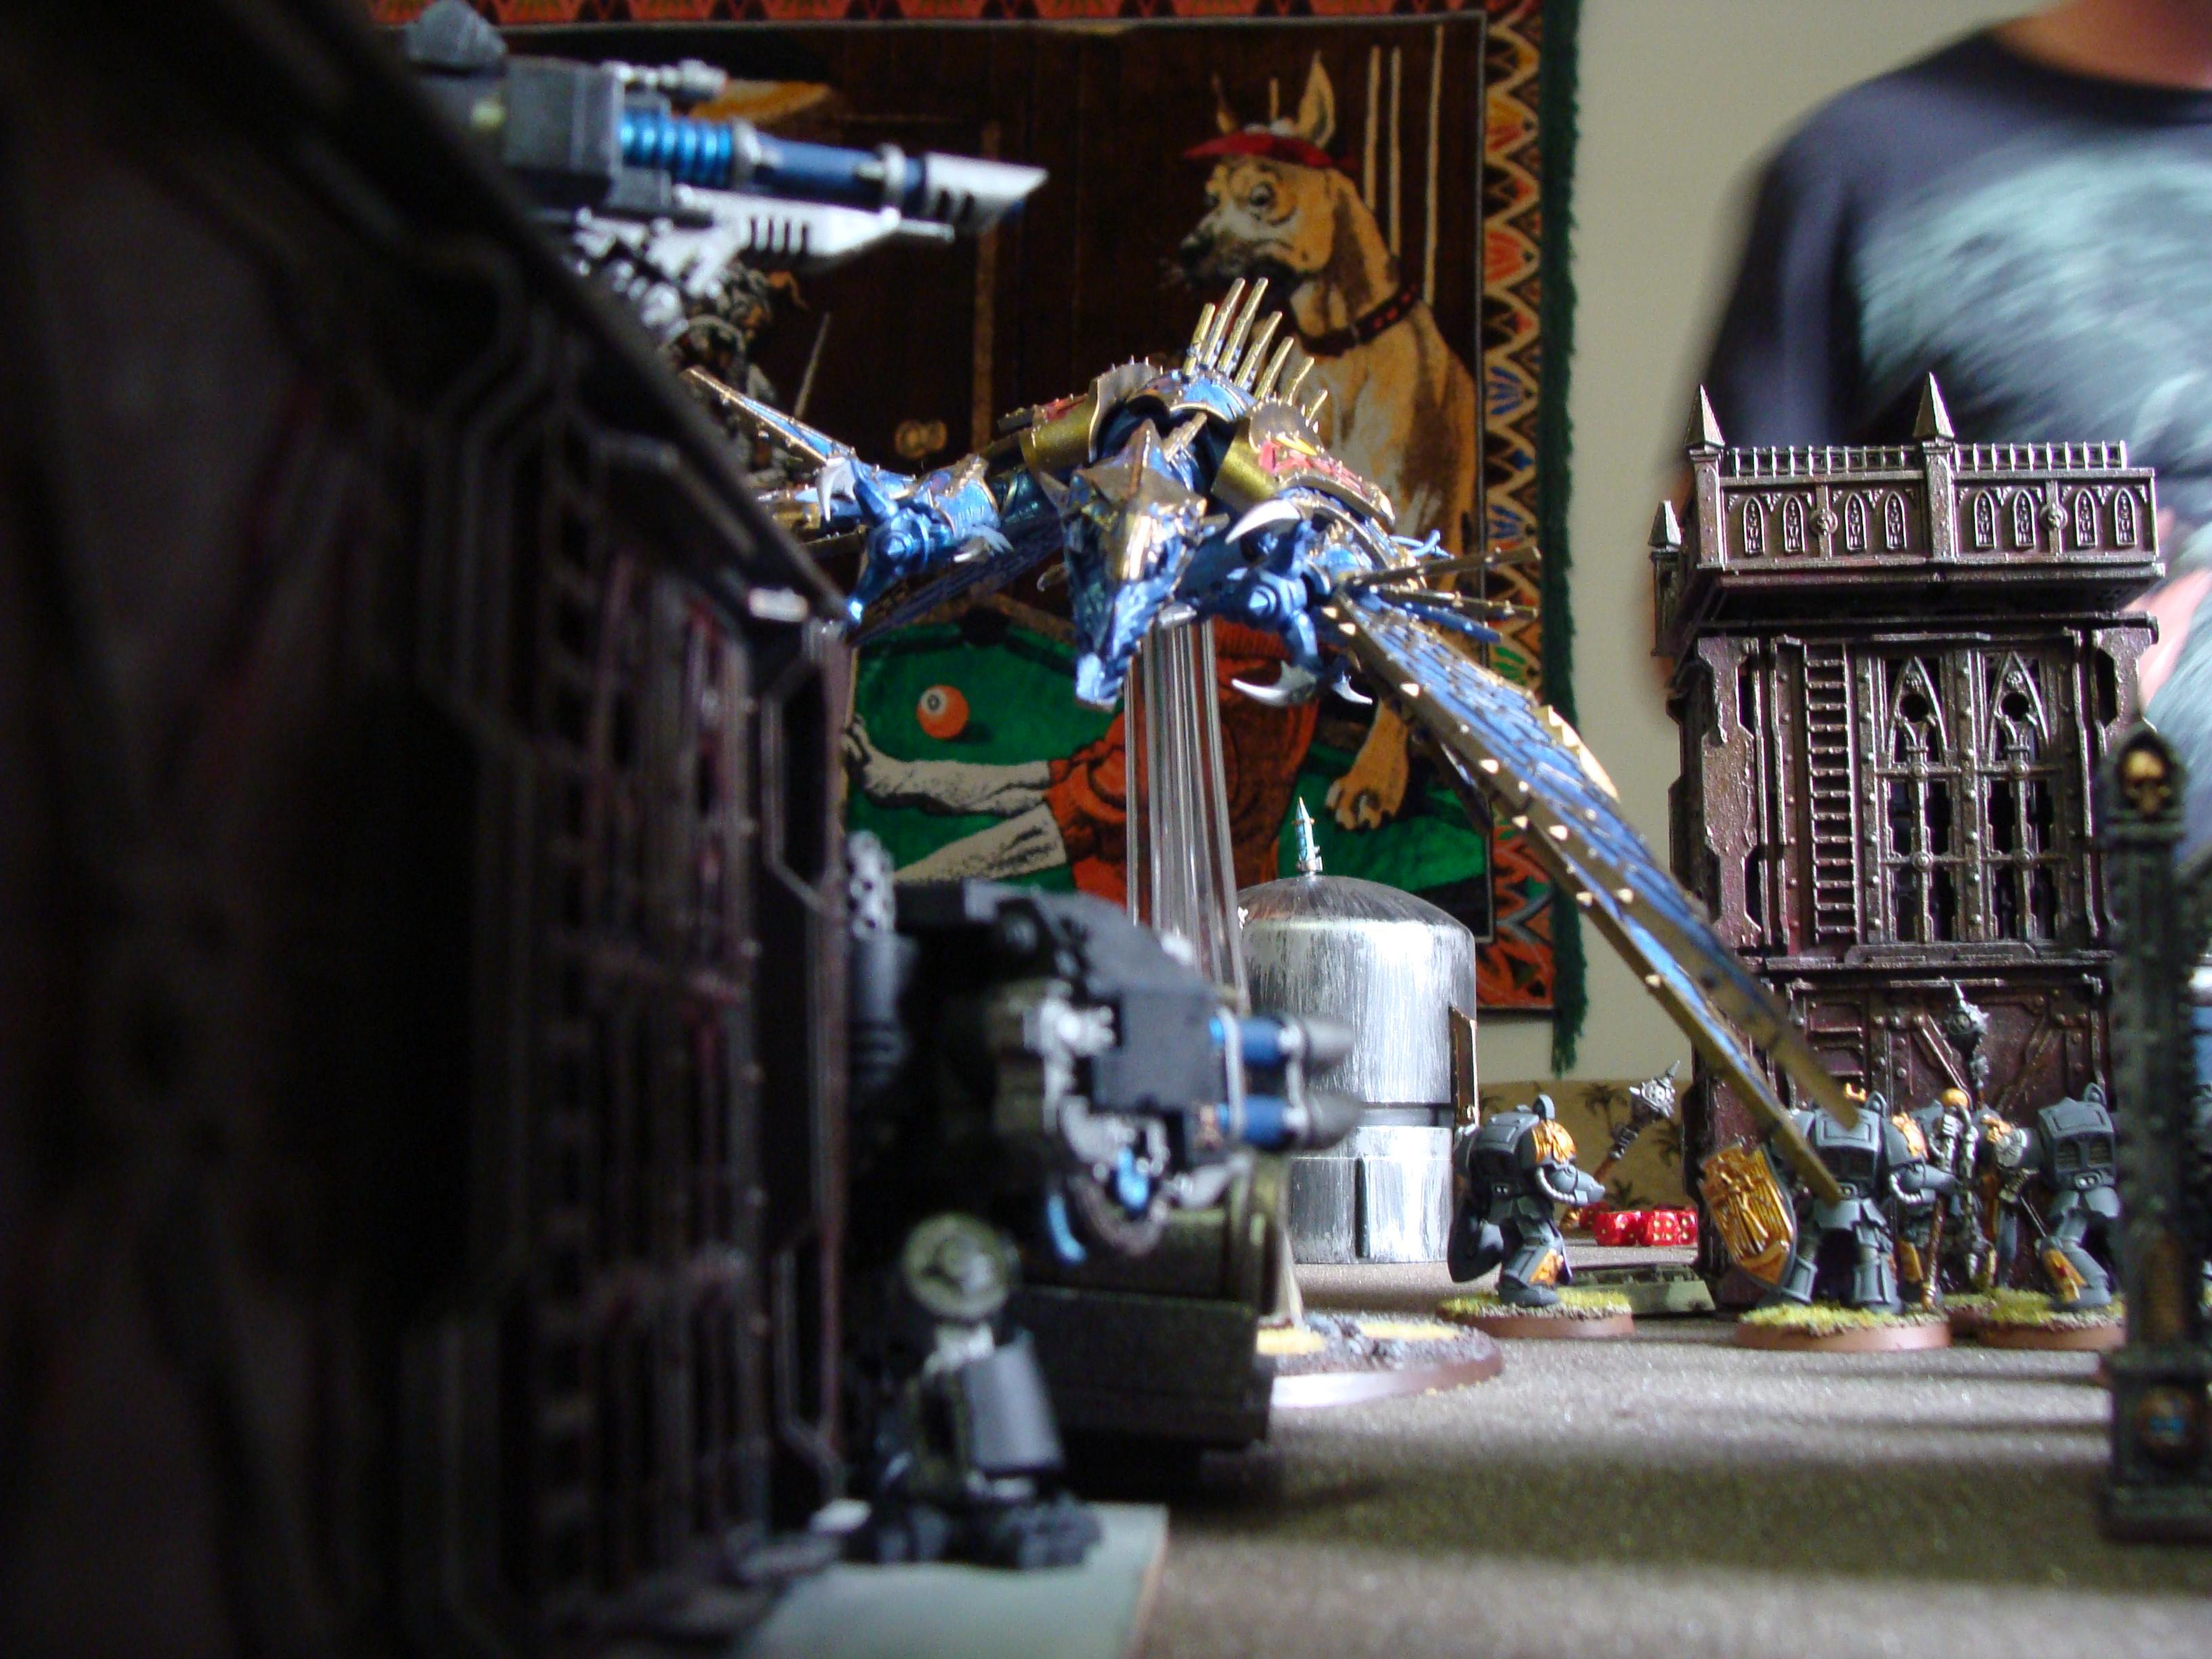 Battle, Battle Report, Chaos, Daemons, Deathwing, Nurgle, Orks, Raven Guard, Report, Space Marines, Thousand Sons, Tzeentch